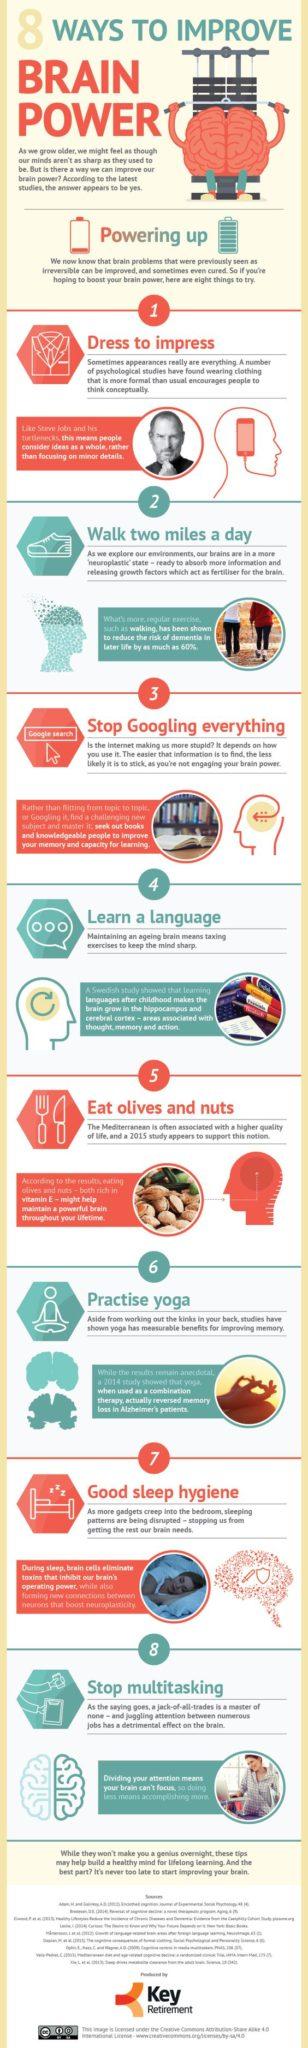 8 Eight Ways To Improve Brain Power (Infographic)